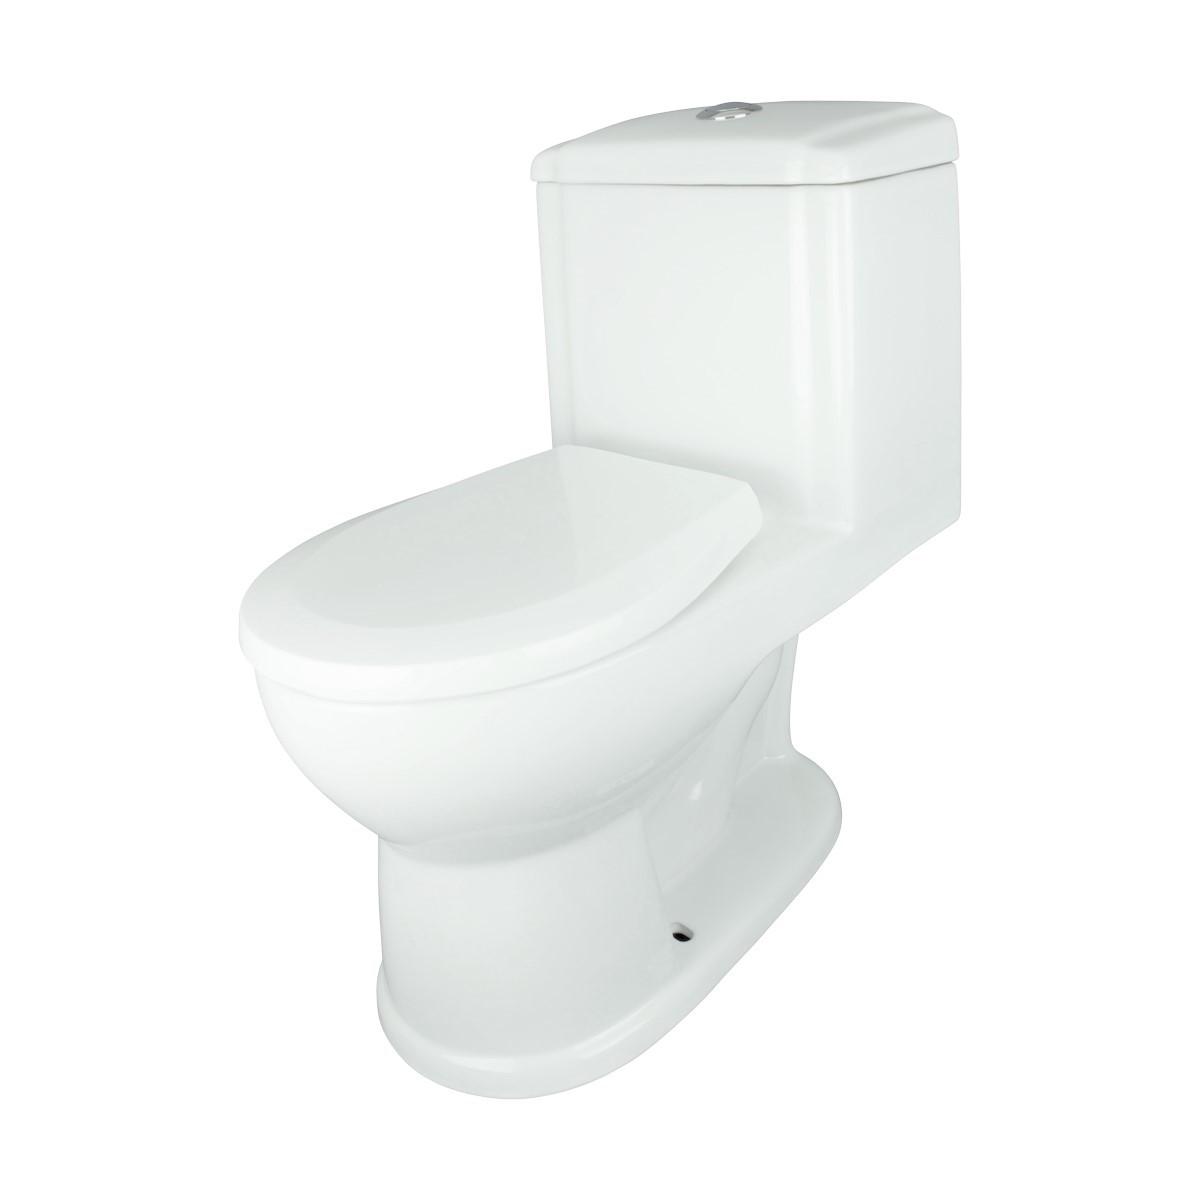 Child sized toilet toddler porcelain toilet renovator for Small toilet